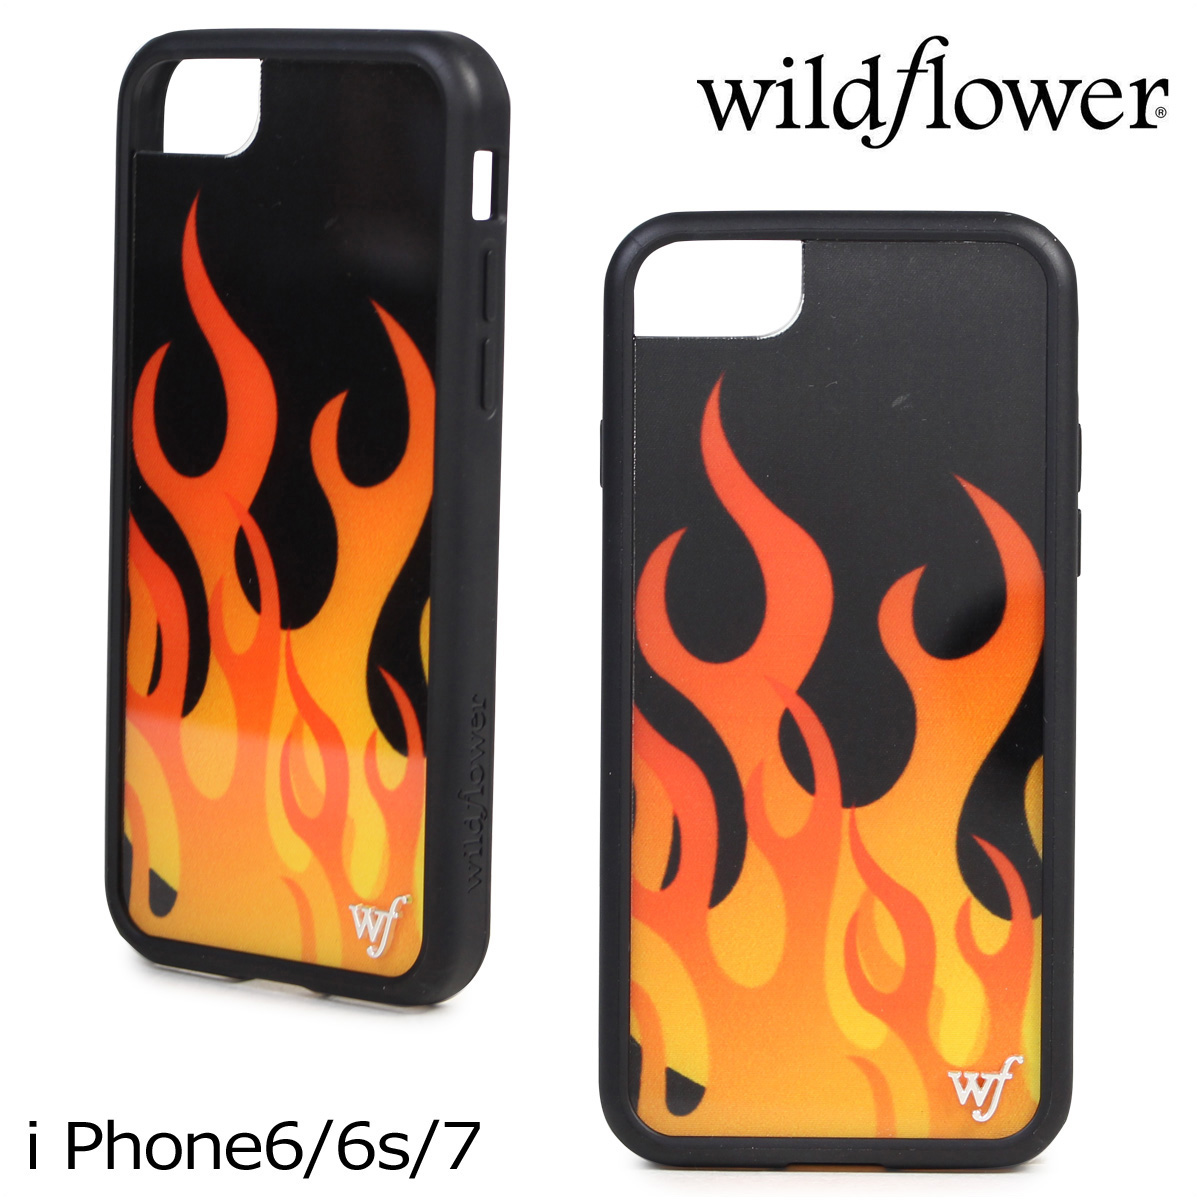 wildflower phone case iphone 7